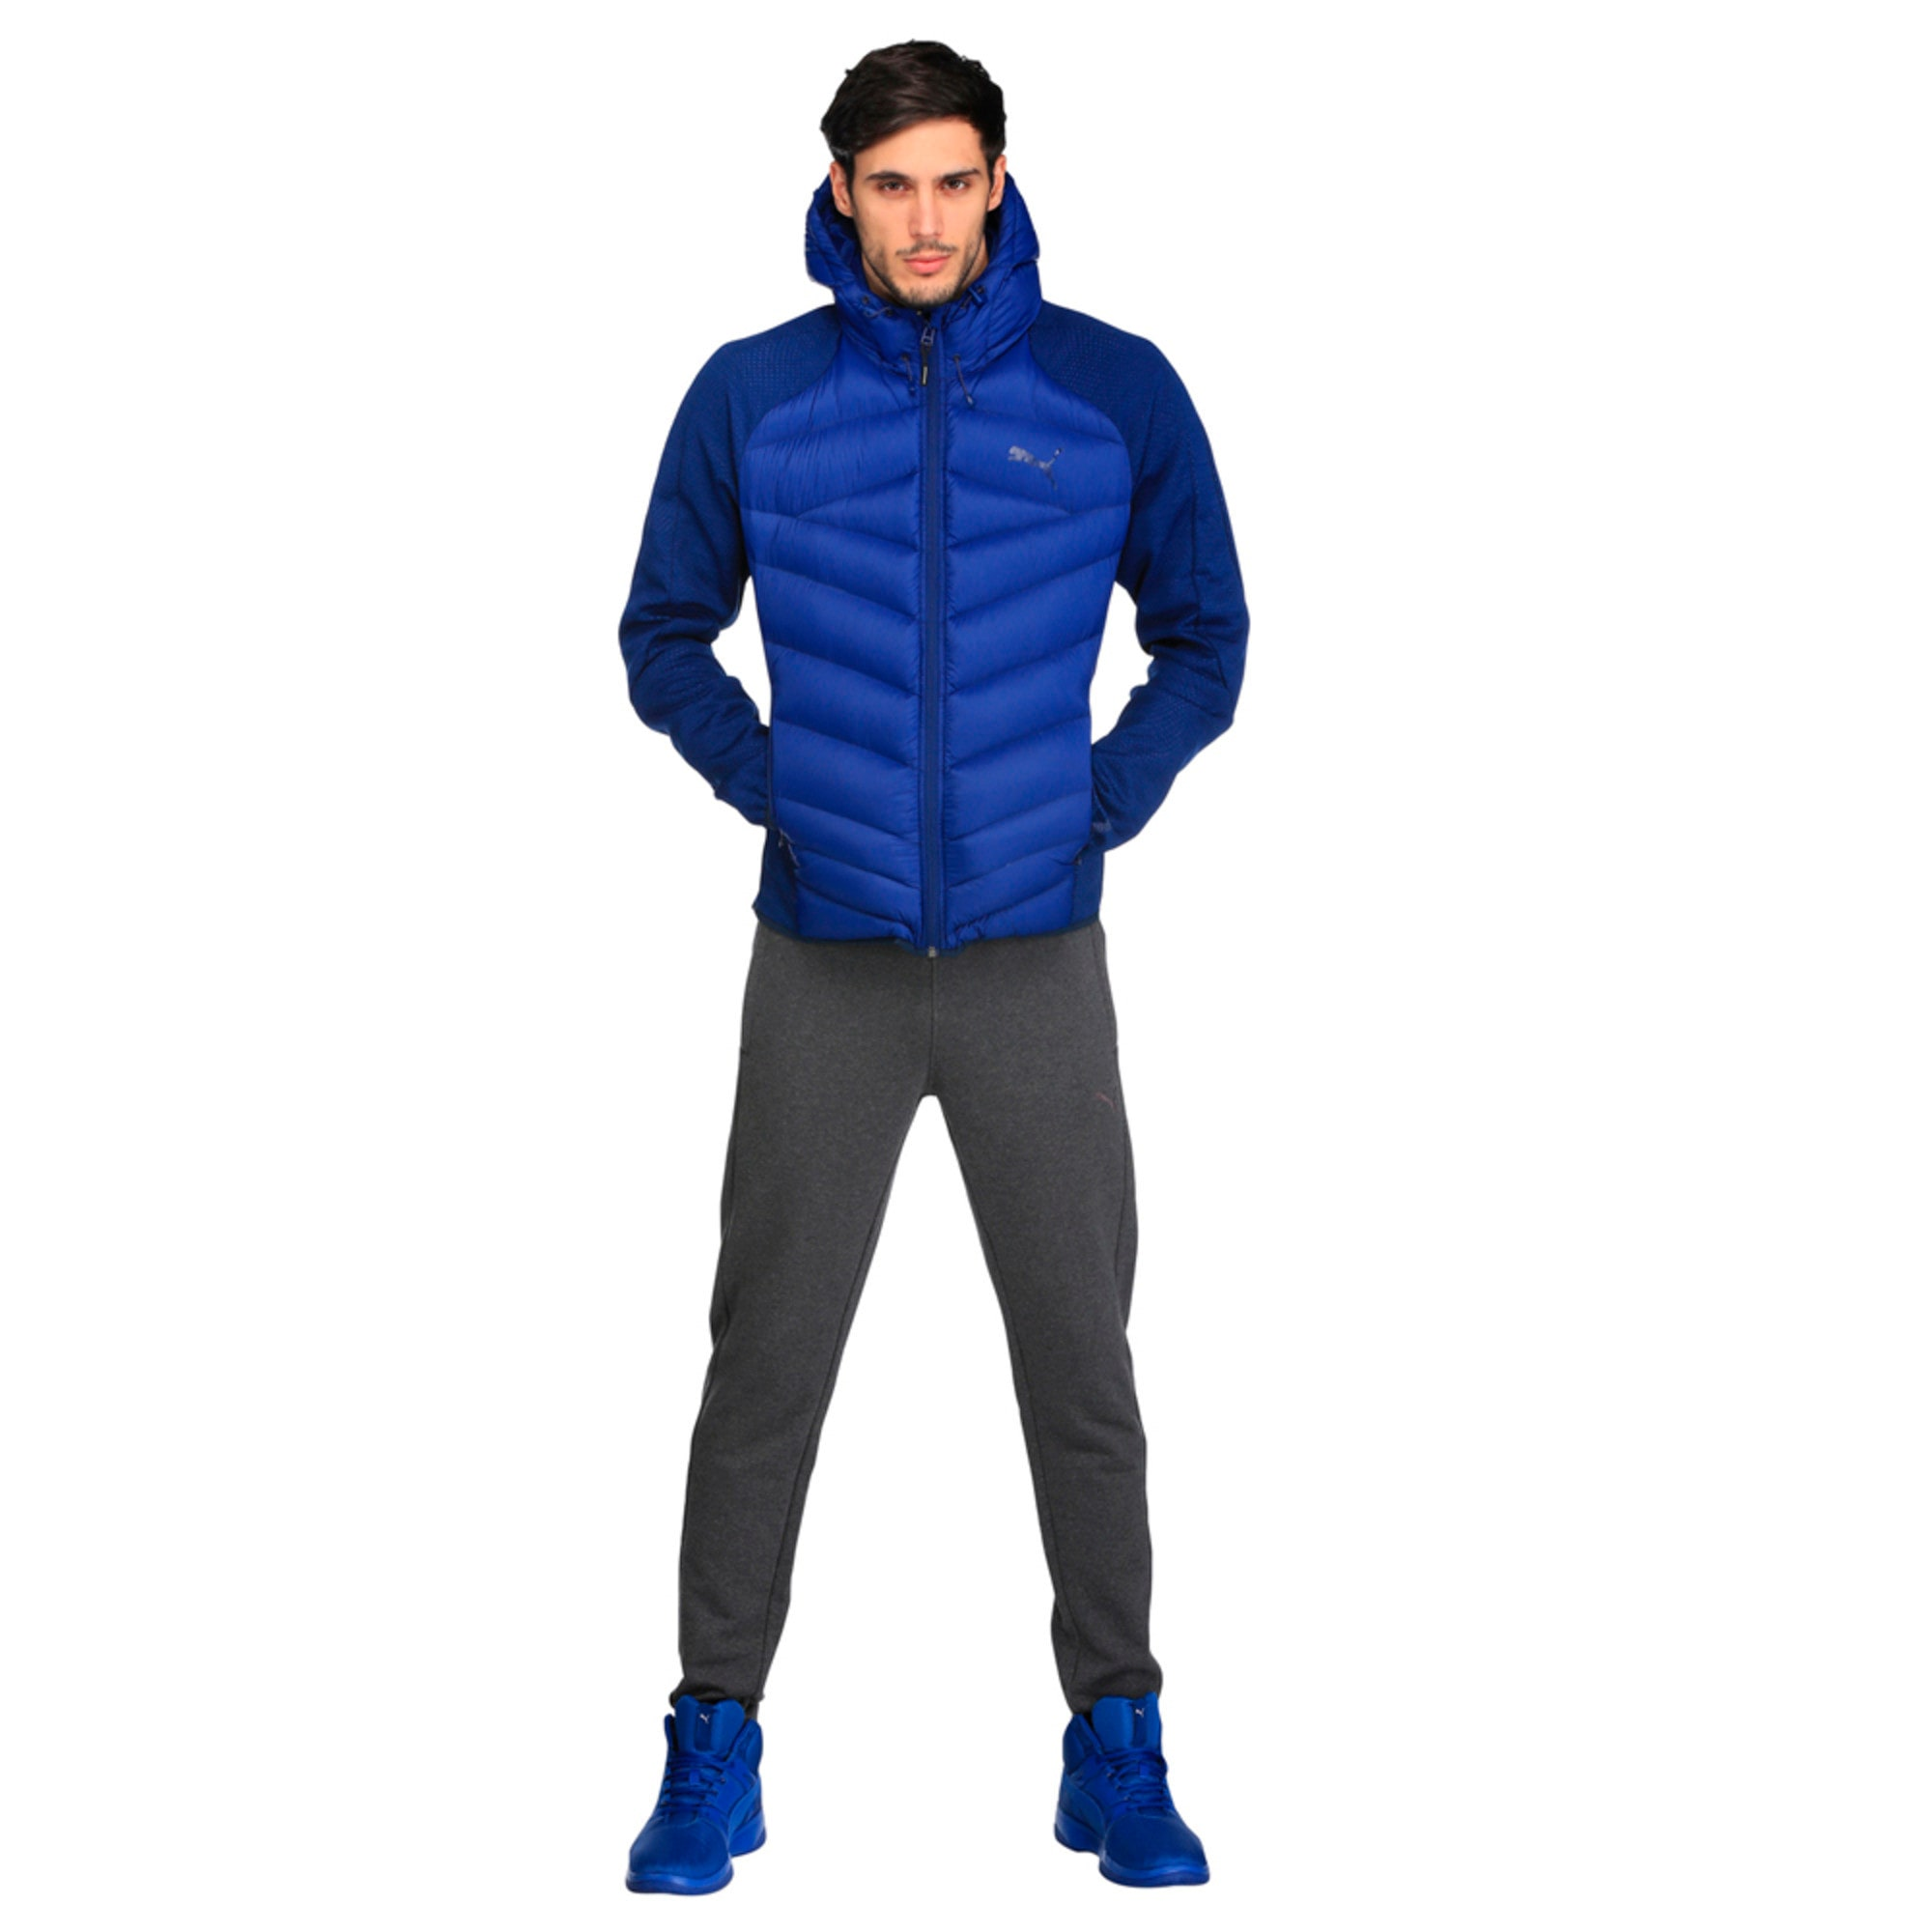 Thumbnail 4 of Double Knit Hybrid 600 Down Men's Jacket, Blue Heather-Blue Depths, medium-IND